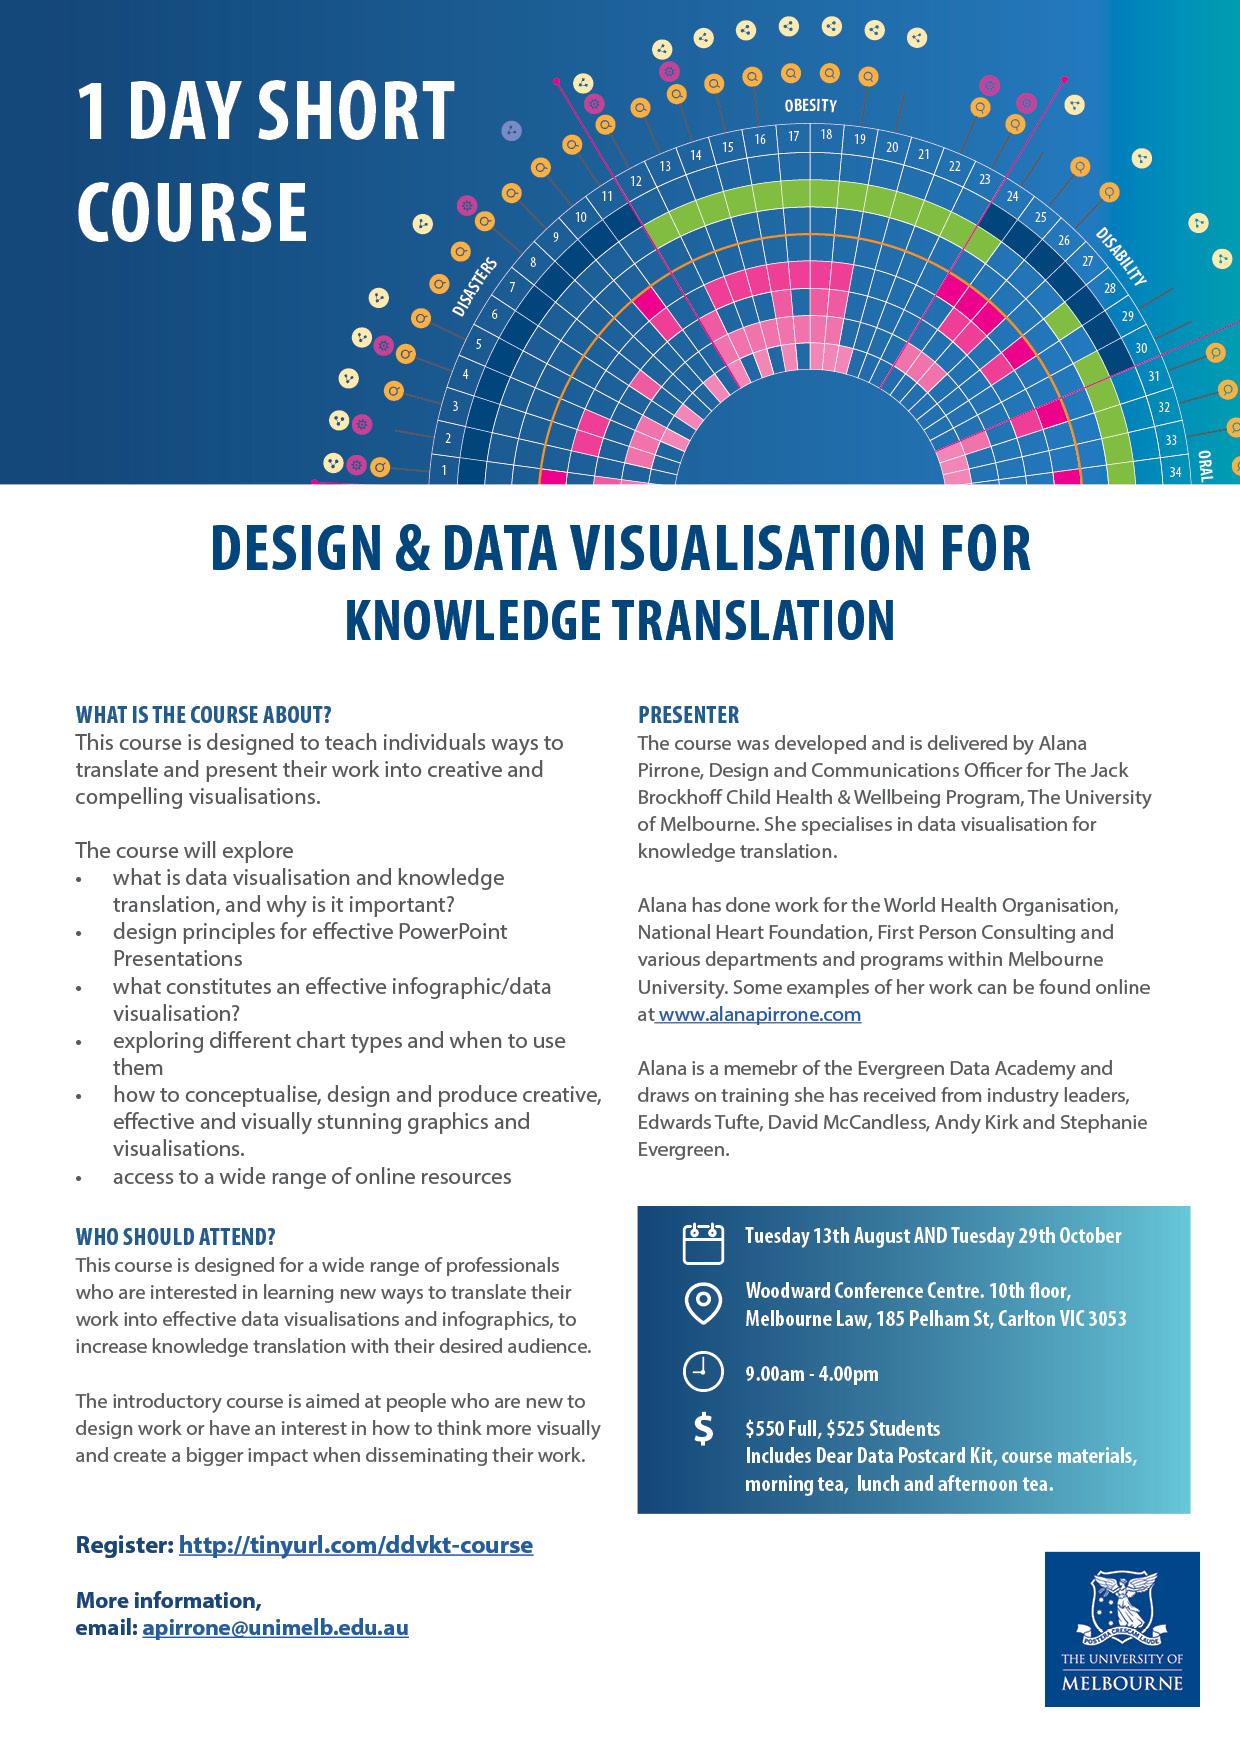 Design and Data Visualisation Short Course Flyer